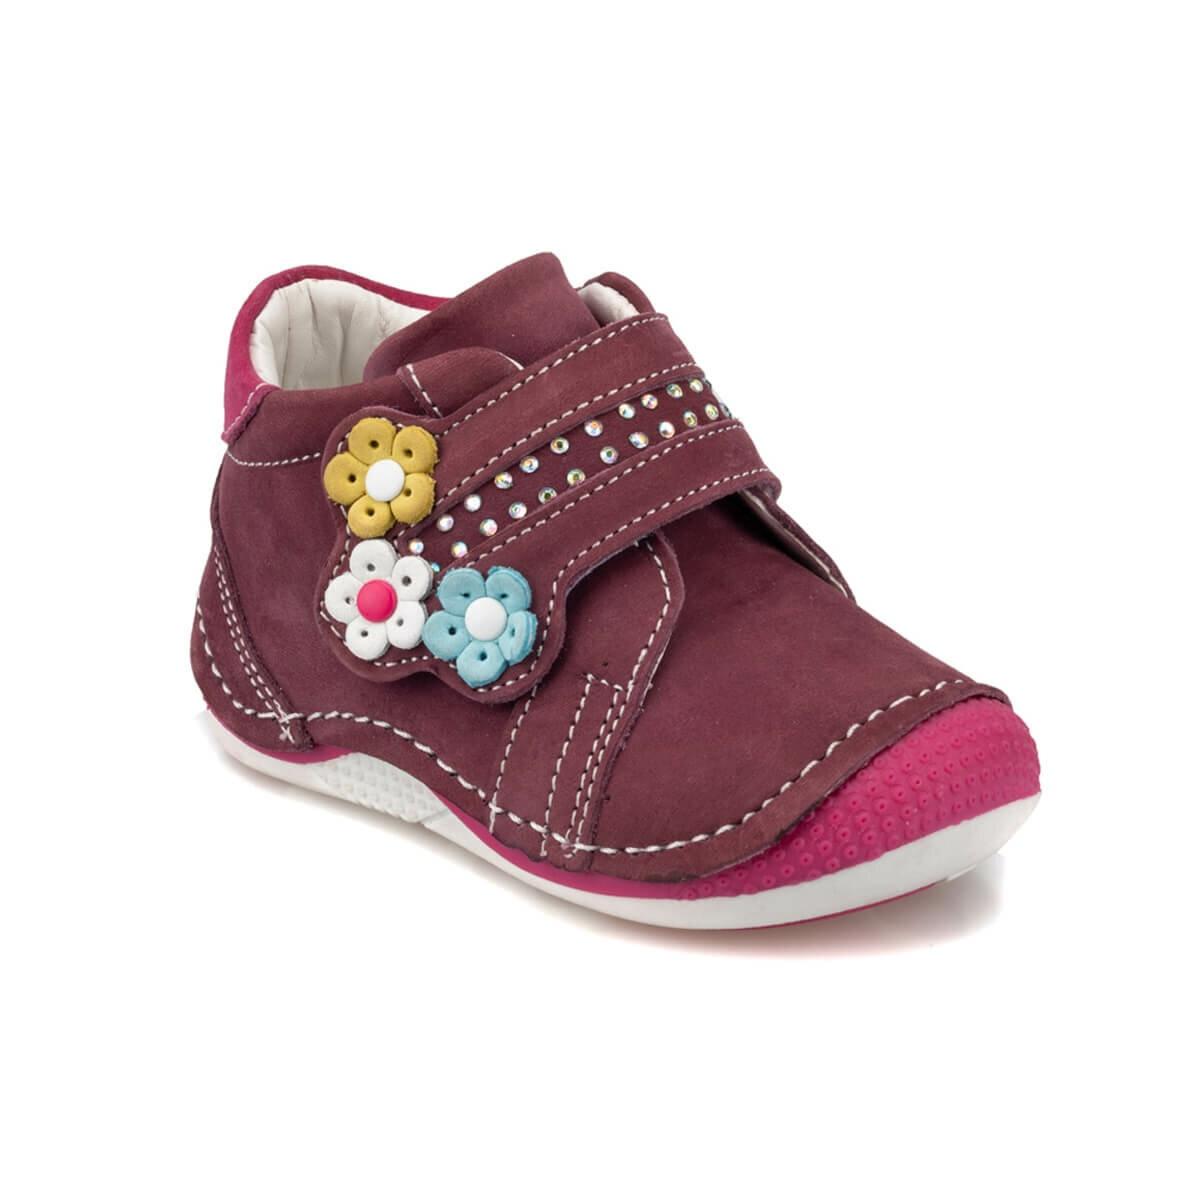 FLO 92.511738.I Purple Female Child Boots Polaris